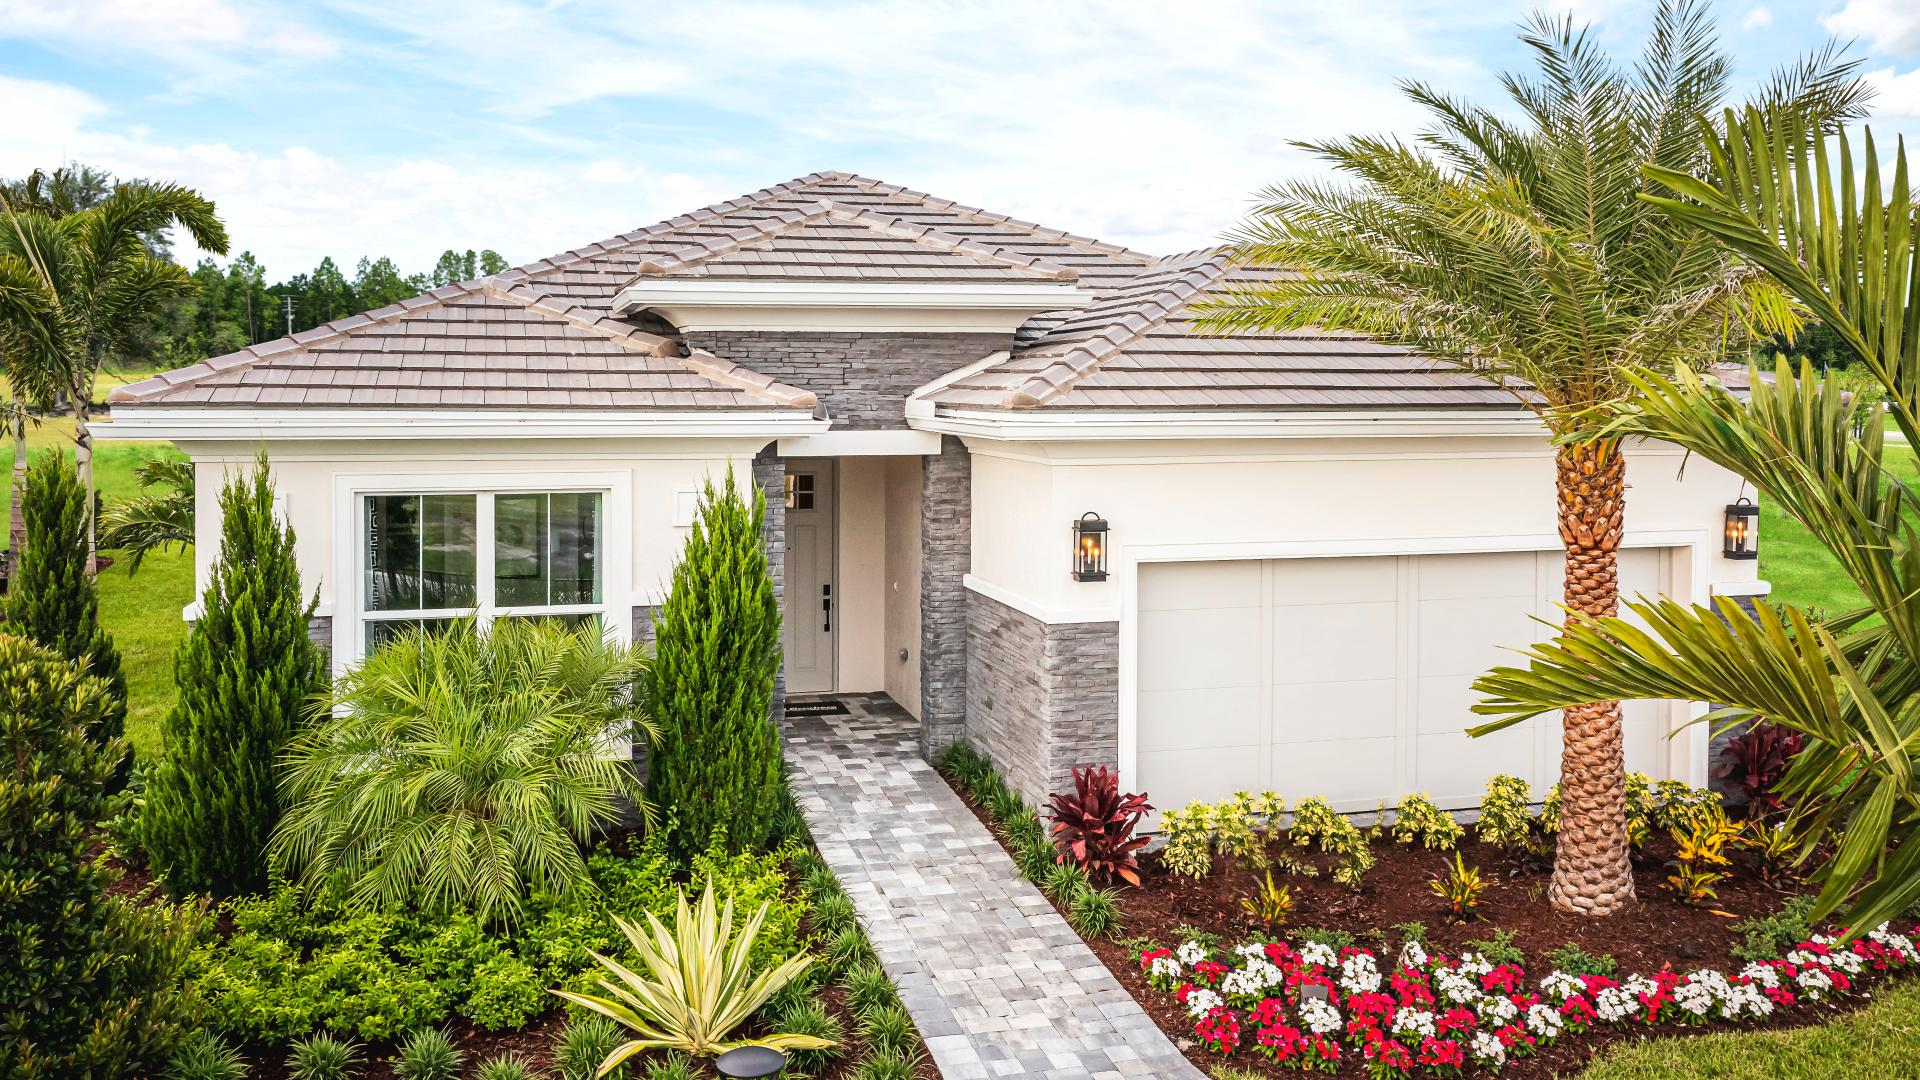 Spacious one-story home designs